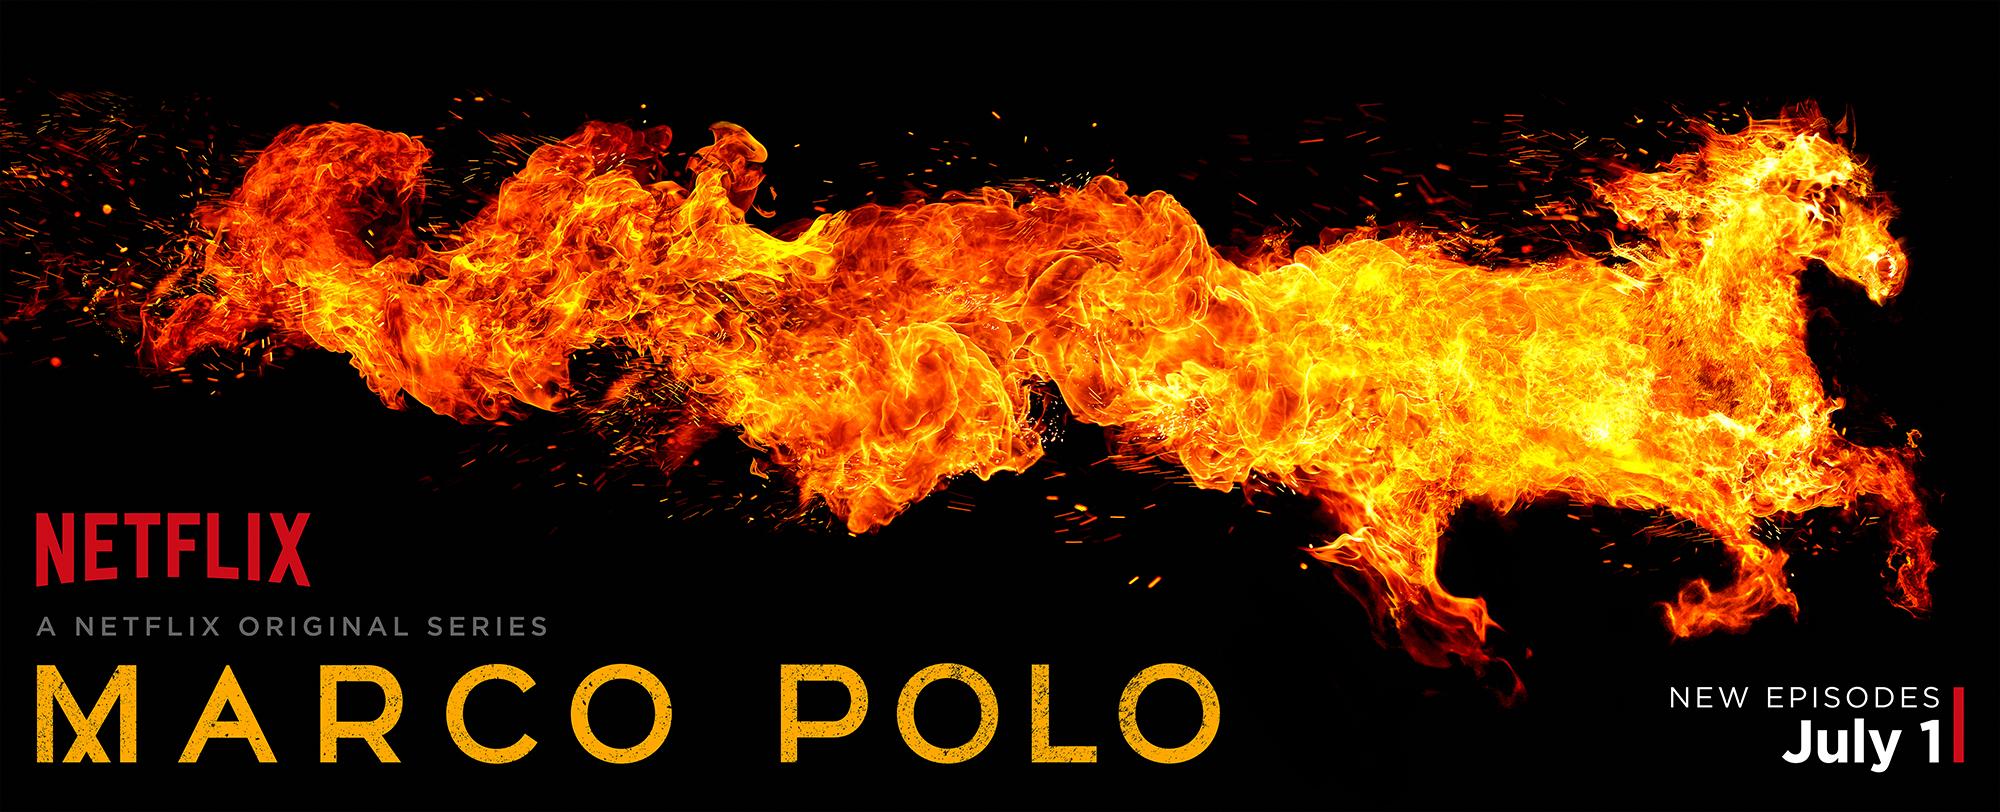 MarcoPoloS2_FireHorse_100dpi.jpg